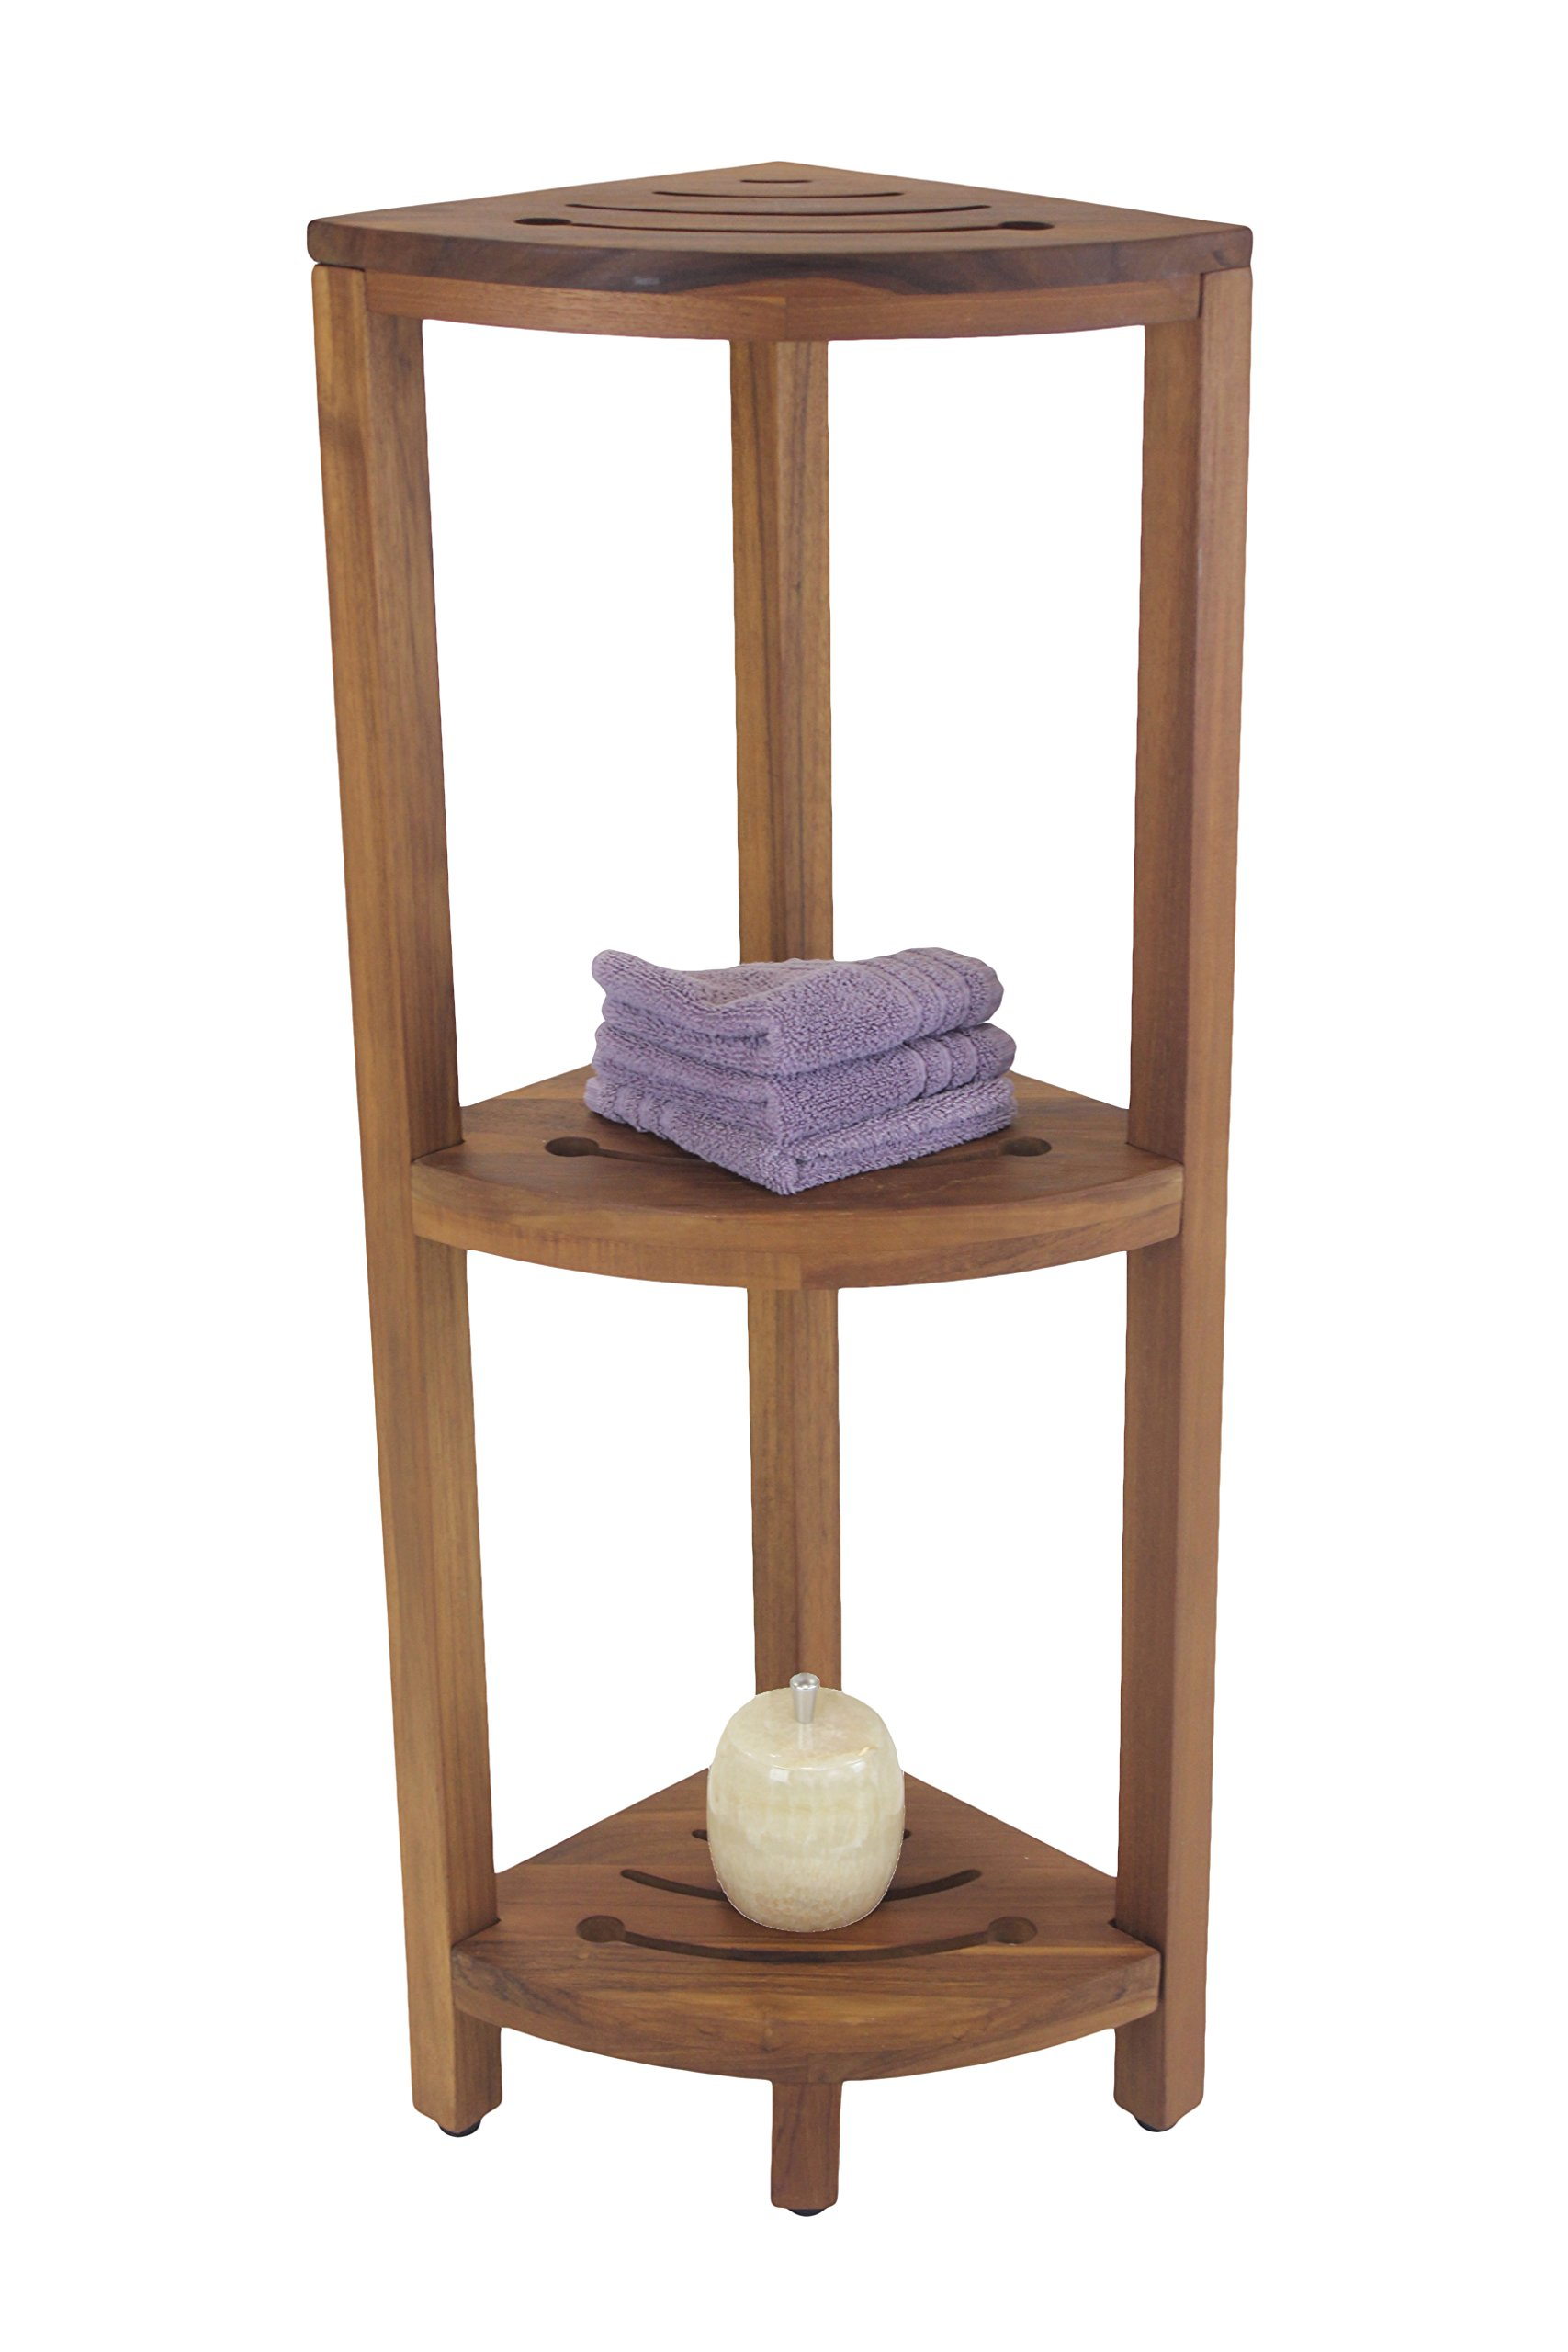 The Original Kai Corner Teak and Stainless 3 Shelf Corner Stand With Square Legs